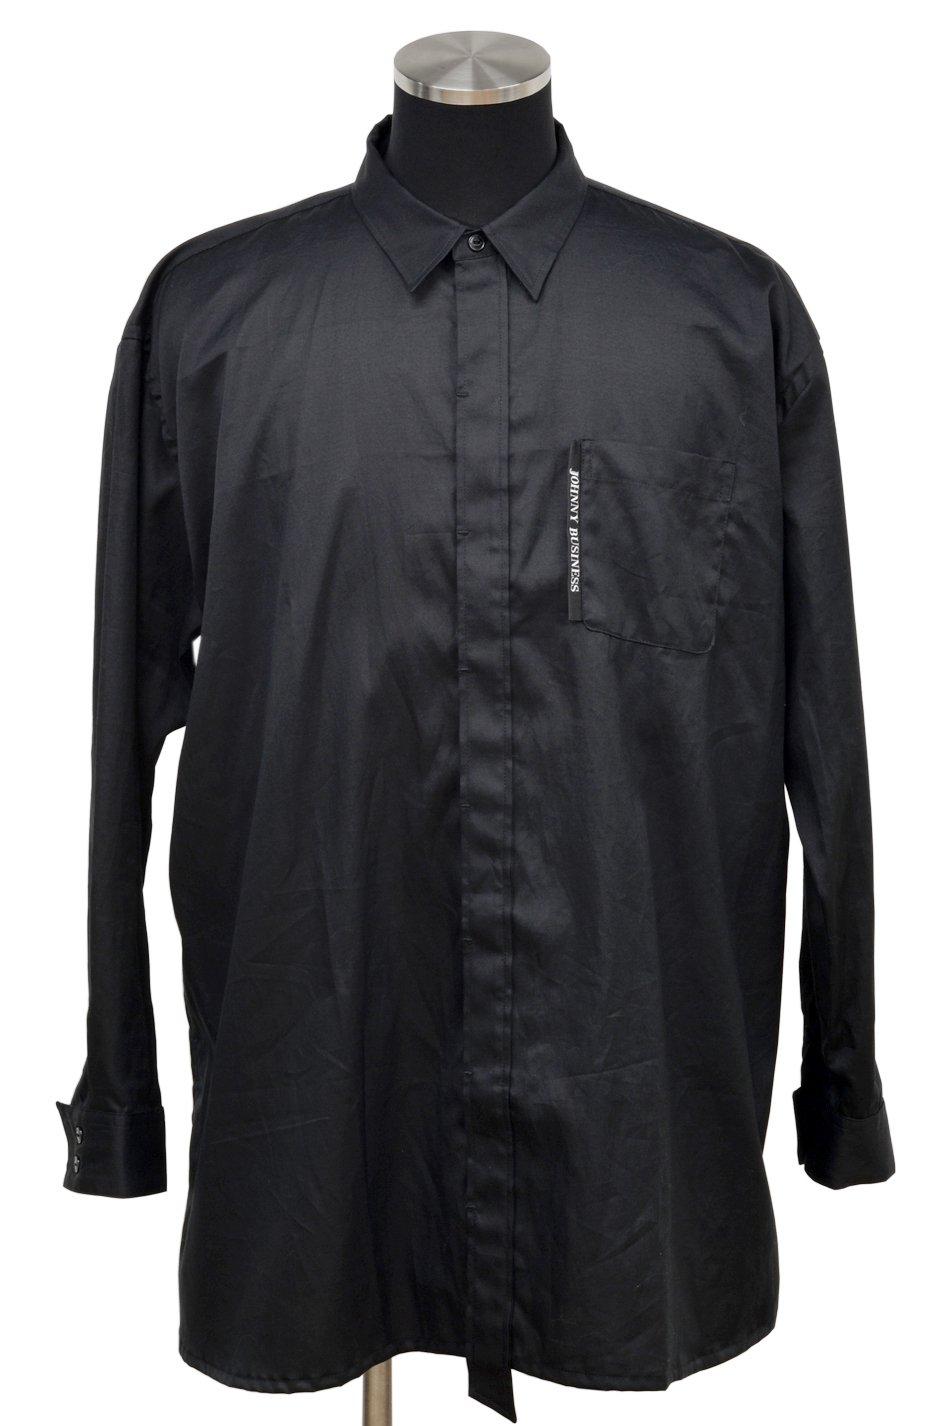 JOHNNY BUSINESS(ジョニービジネス )Plane Shirt / Black